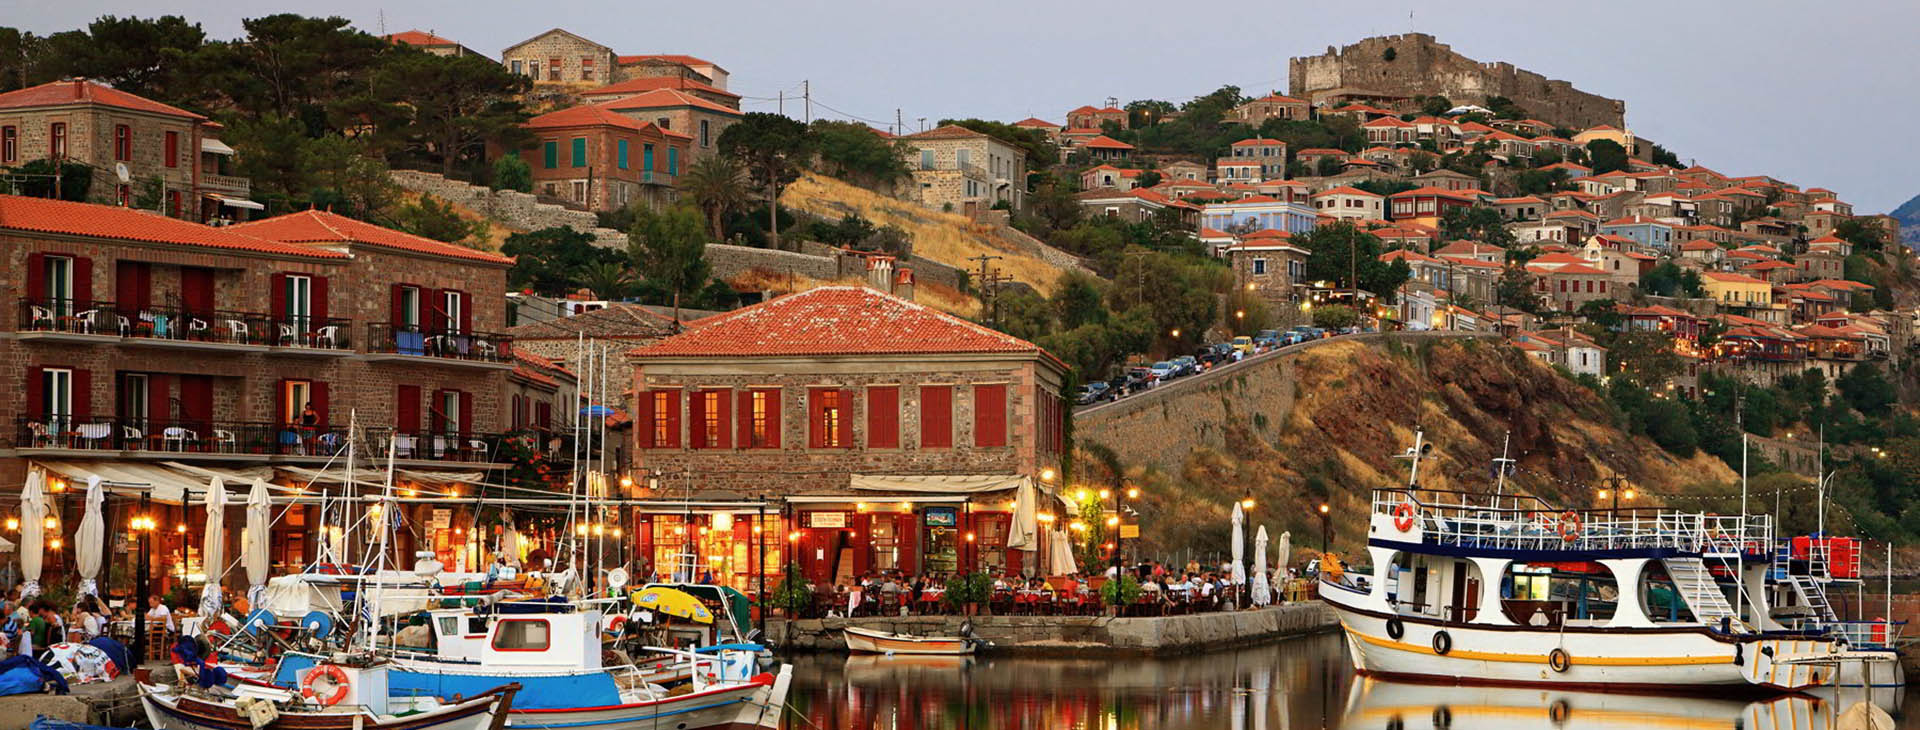 Mytilene town and harbour, Lesvos island